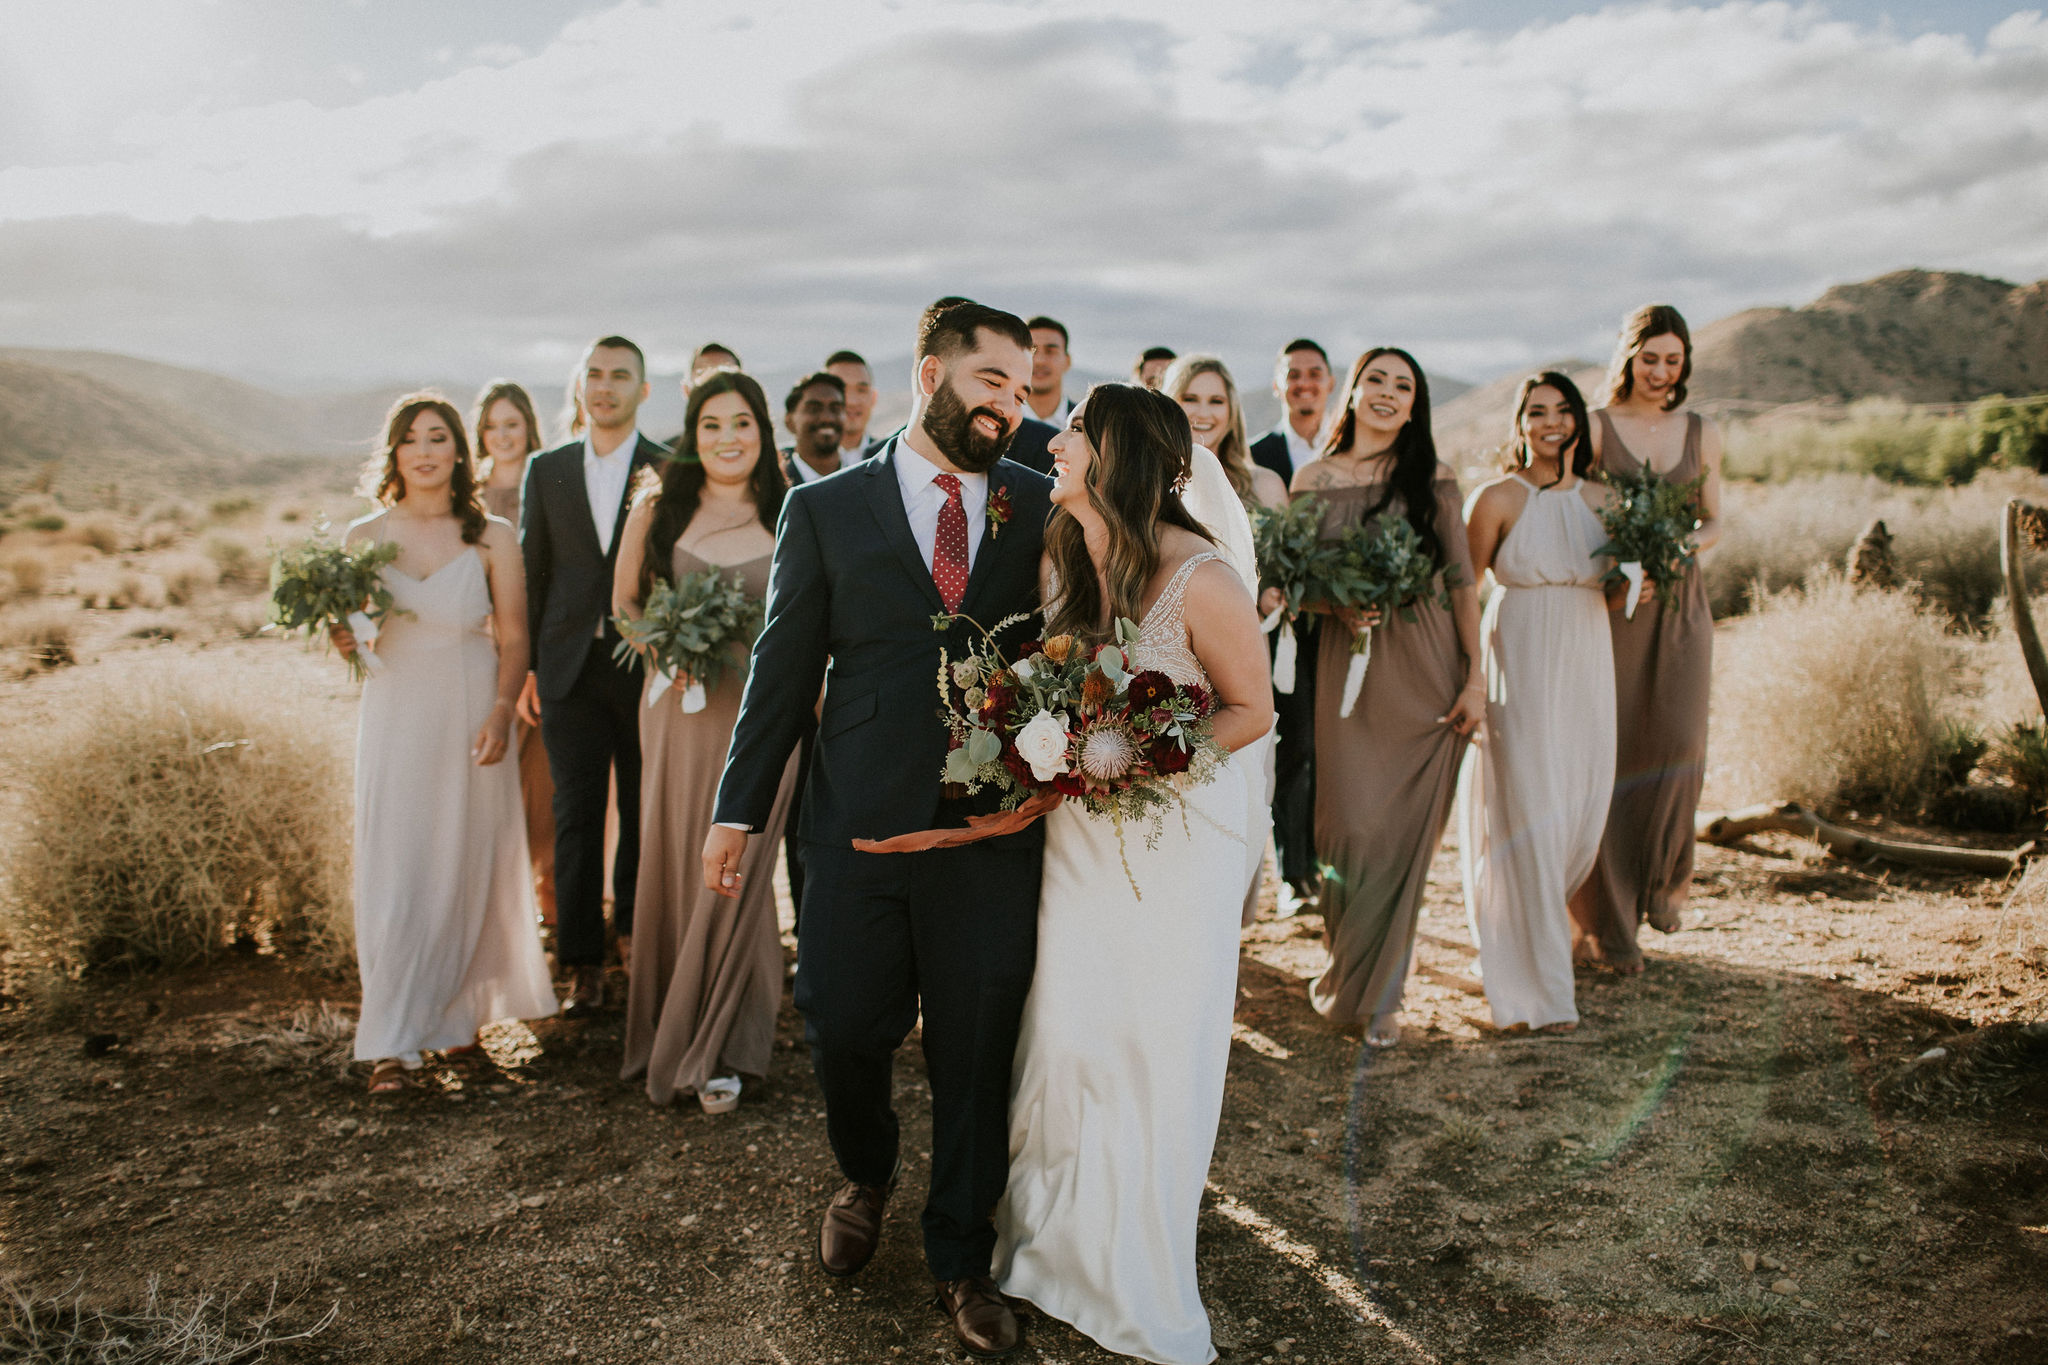 RimrockRanch-JoshuaTree-Wedding-Jami-Laree-499.jpg